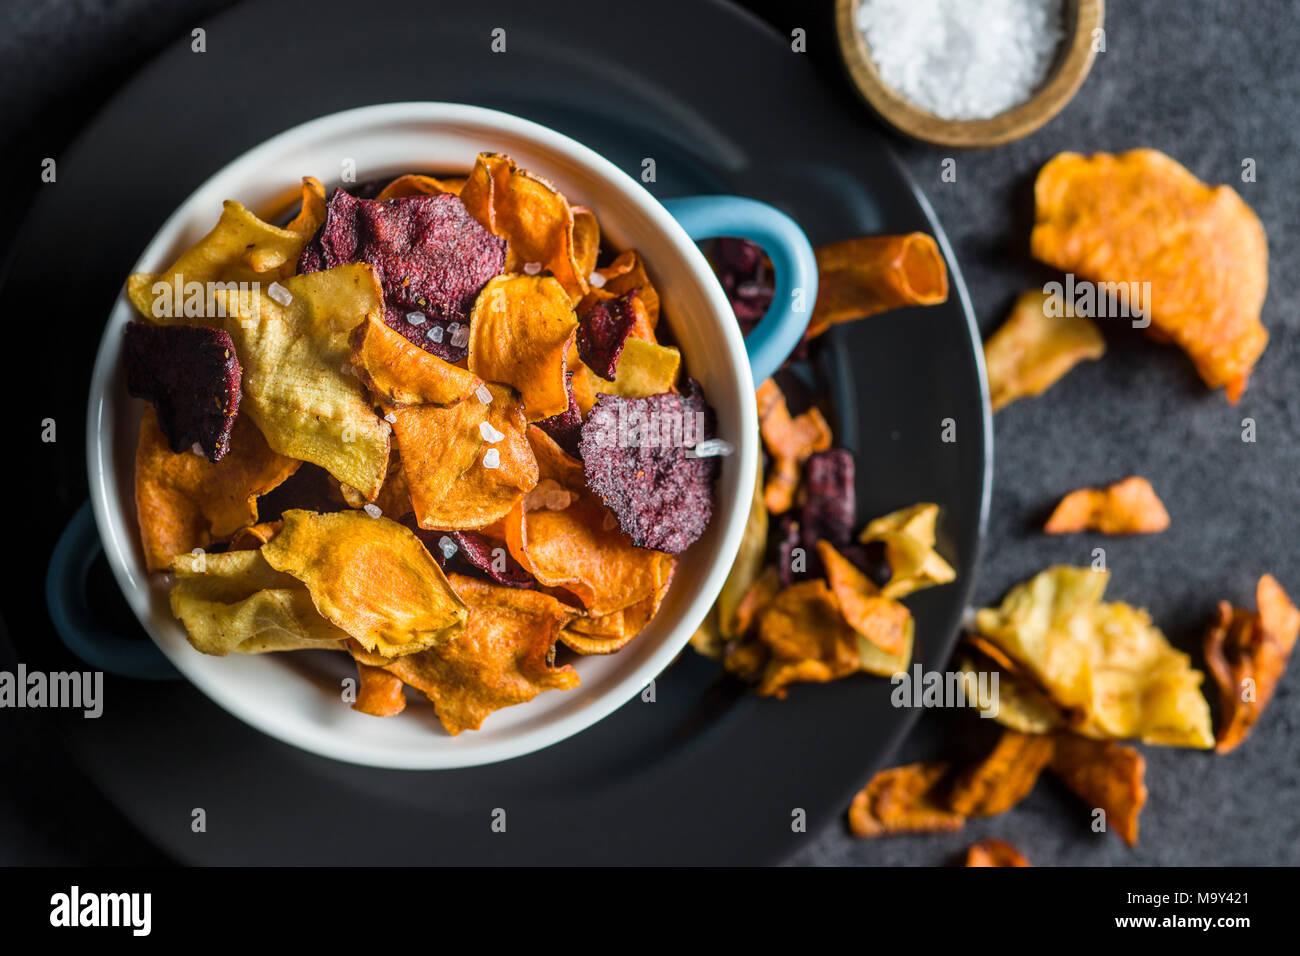 Mezcla de verduras fritas chips en bote. Imagen De Stock